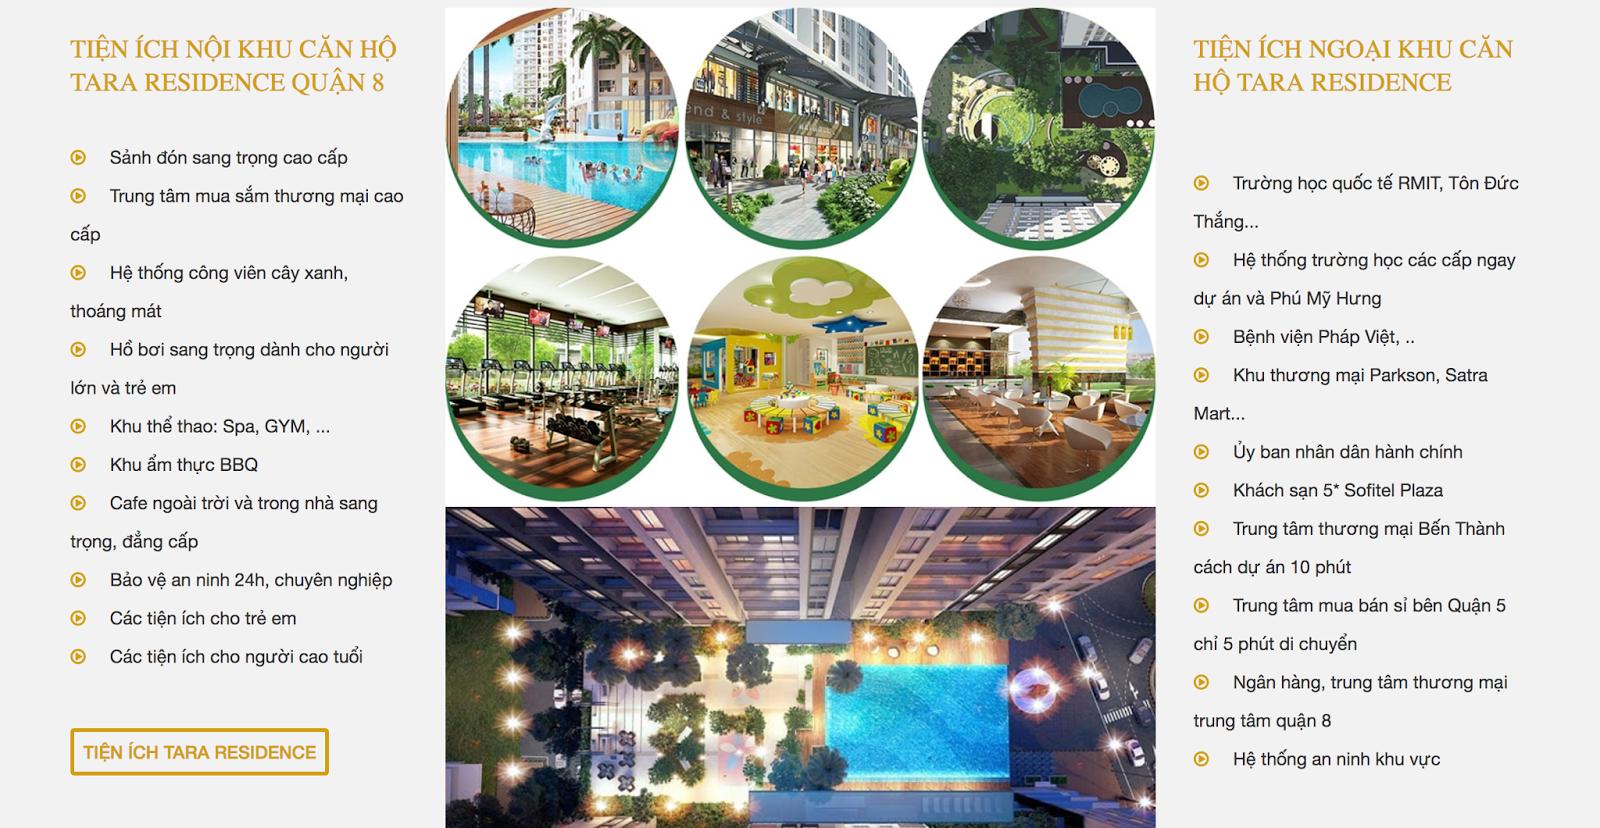 tiện ích dự án tara residence